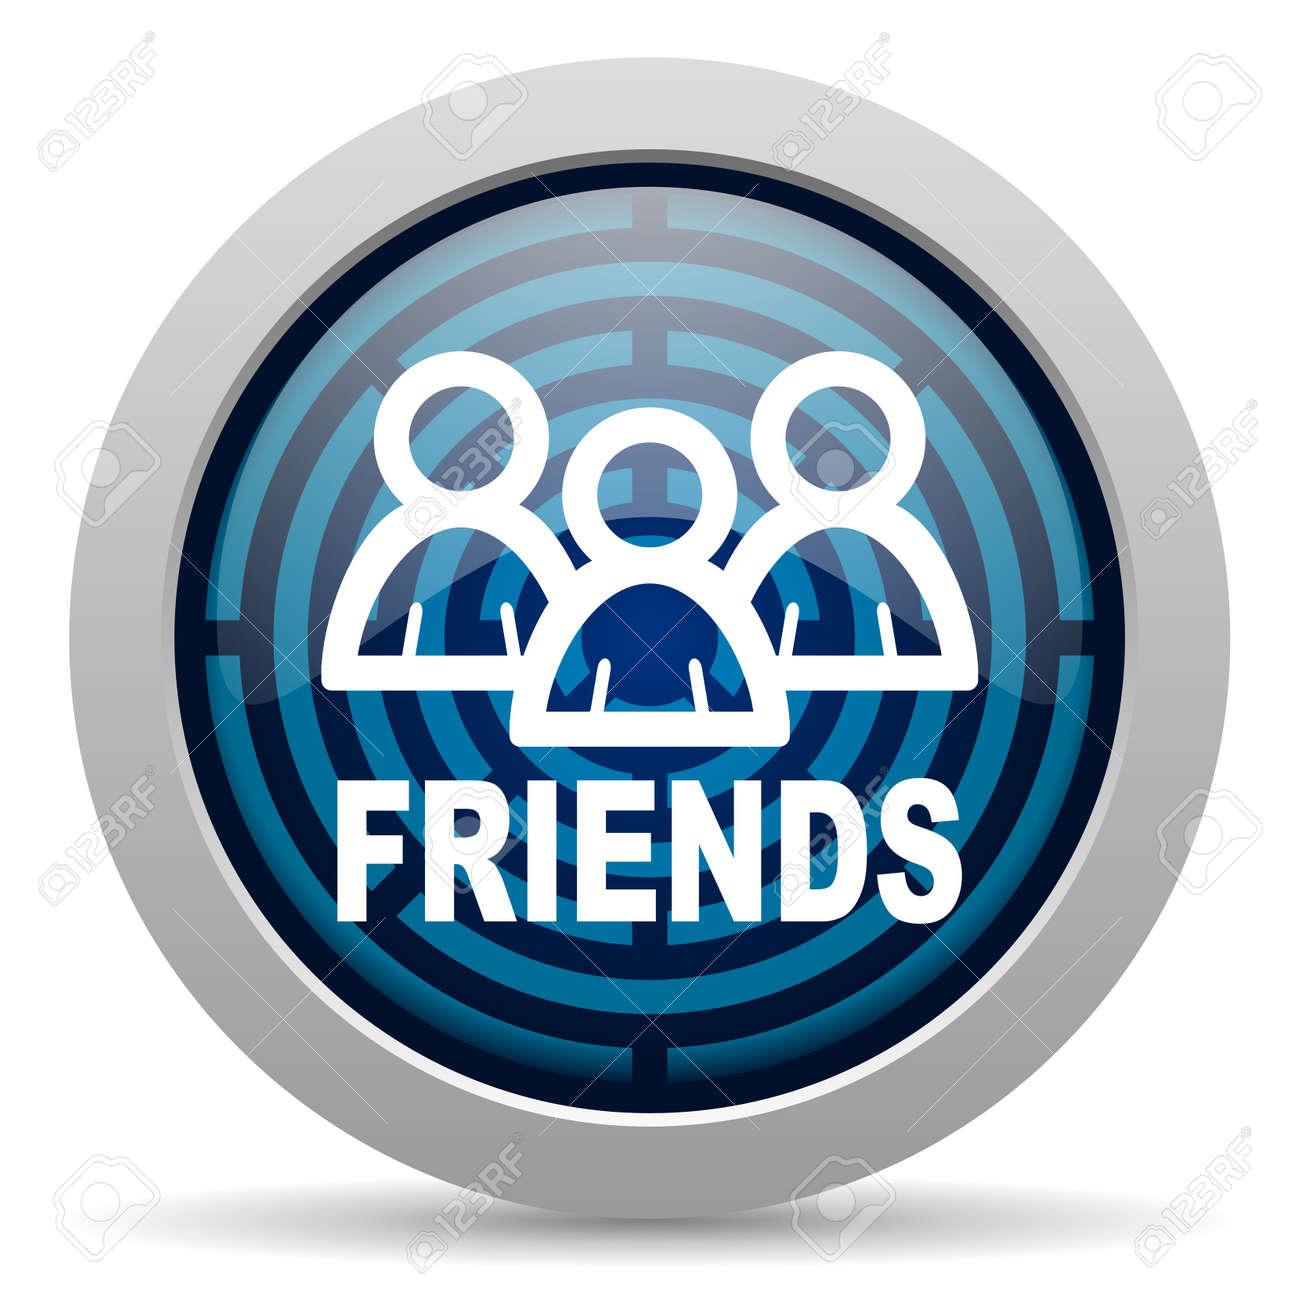 friends icon Stock Photo - 15418049